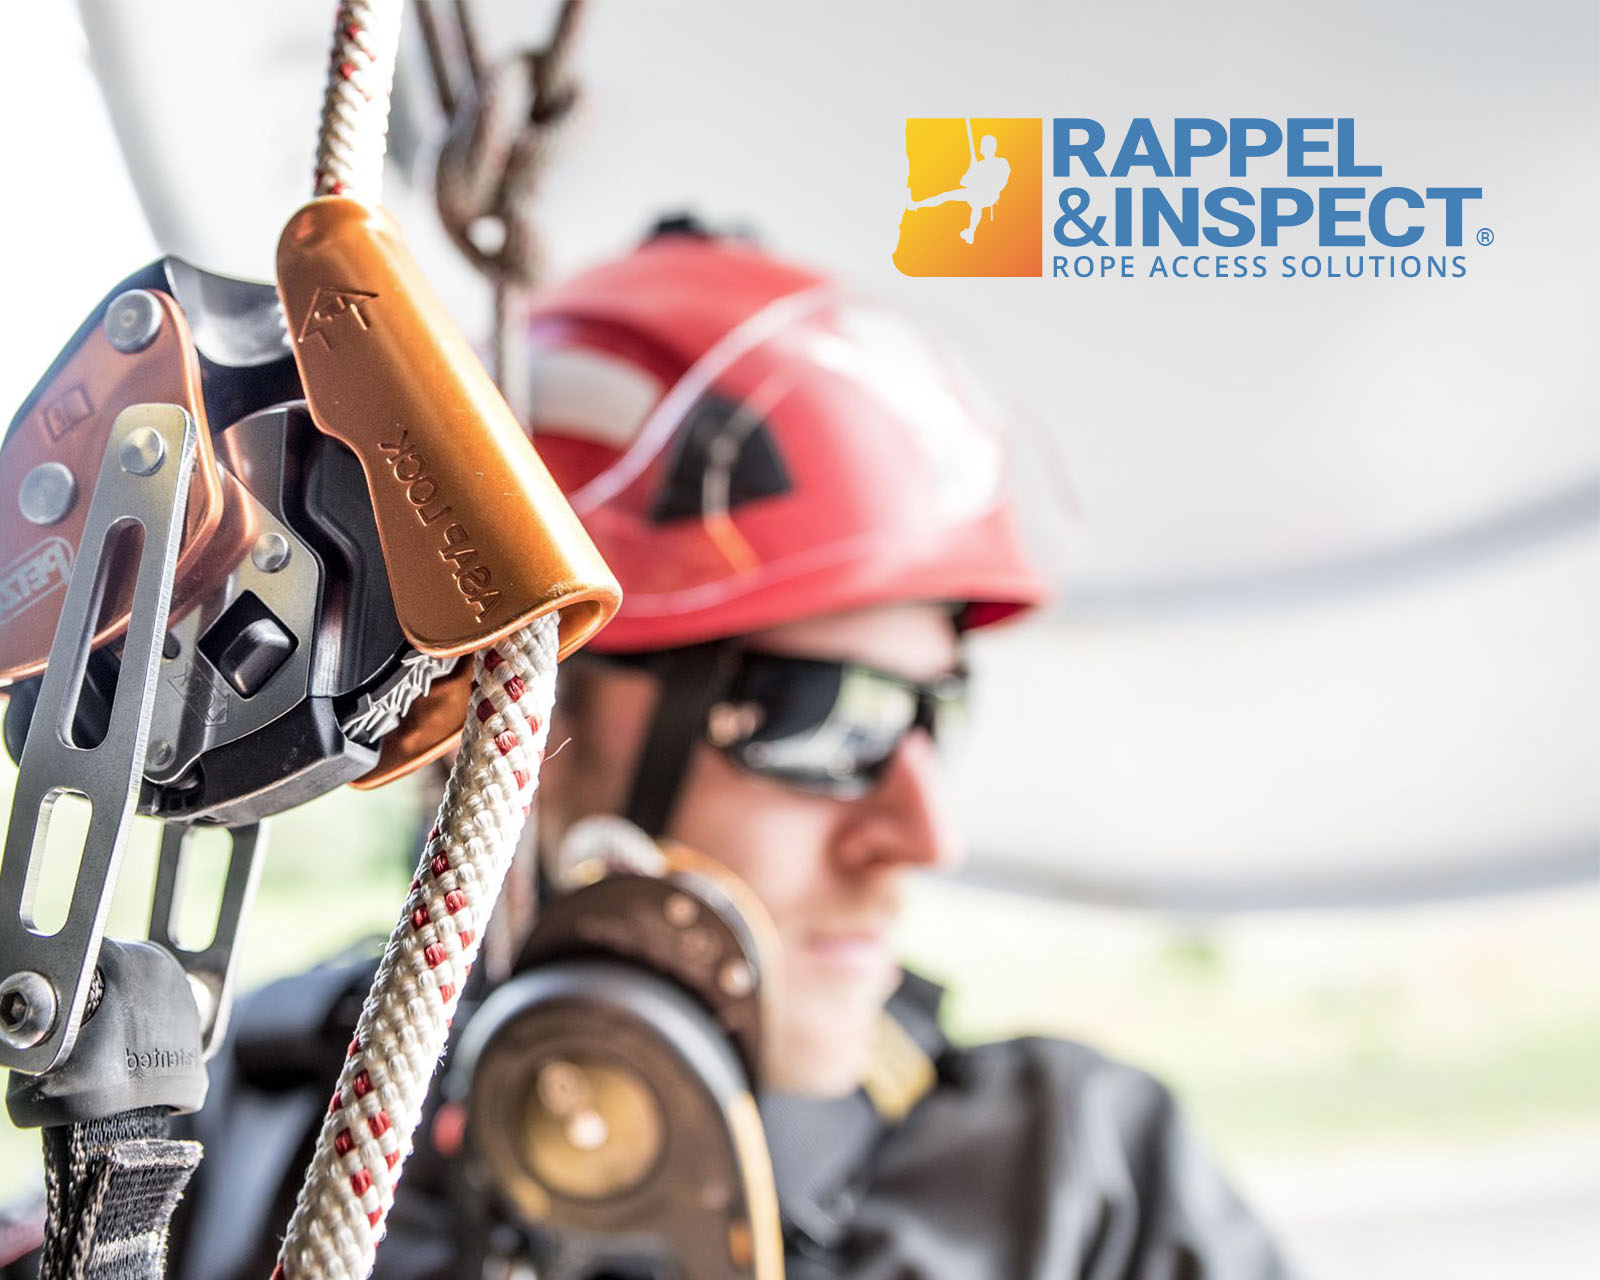 Rappel & Inspect